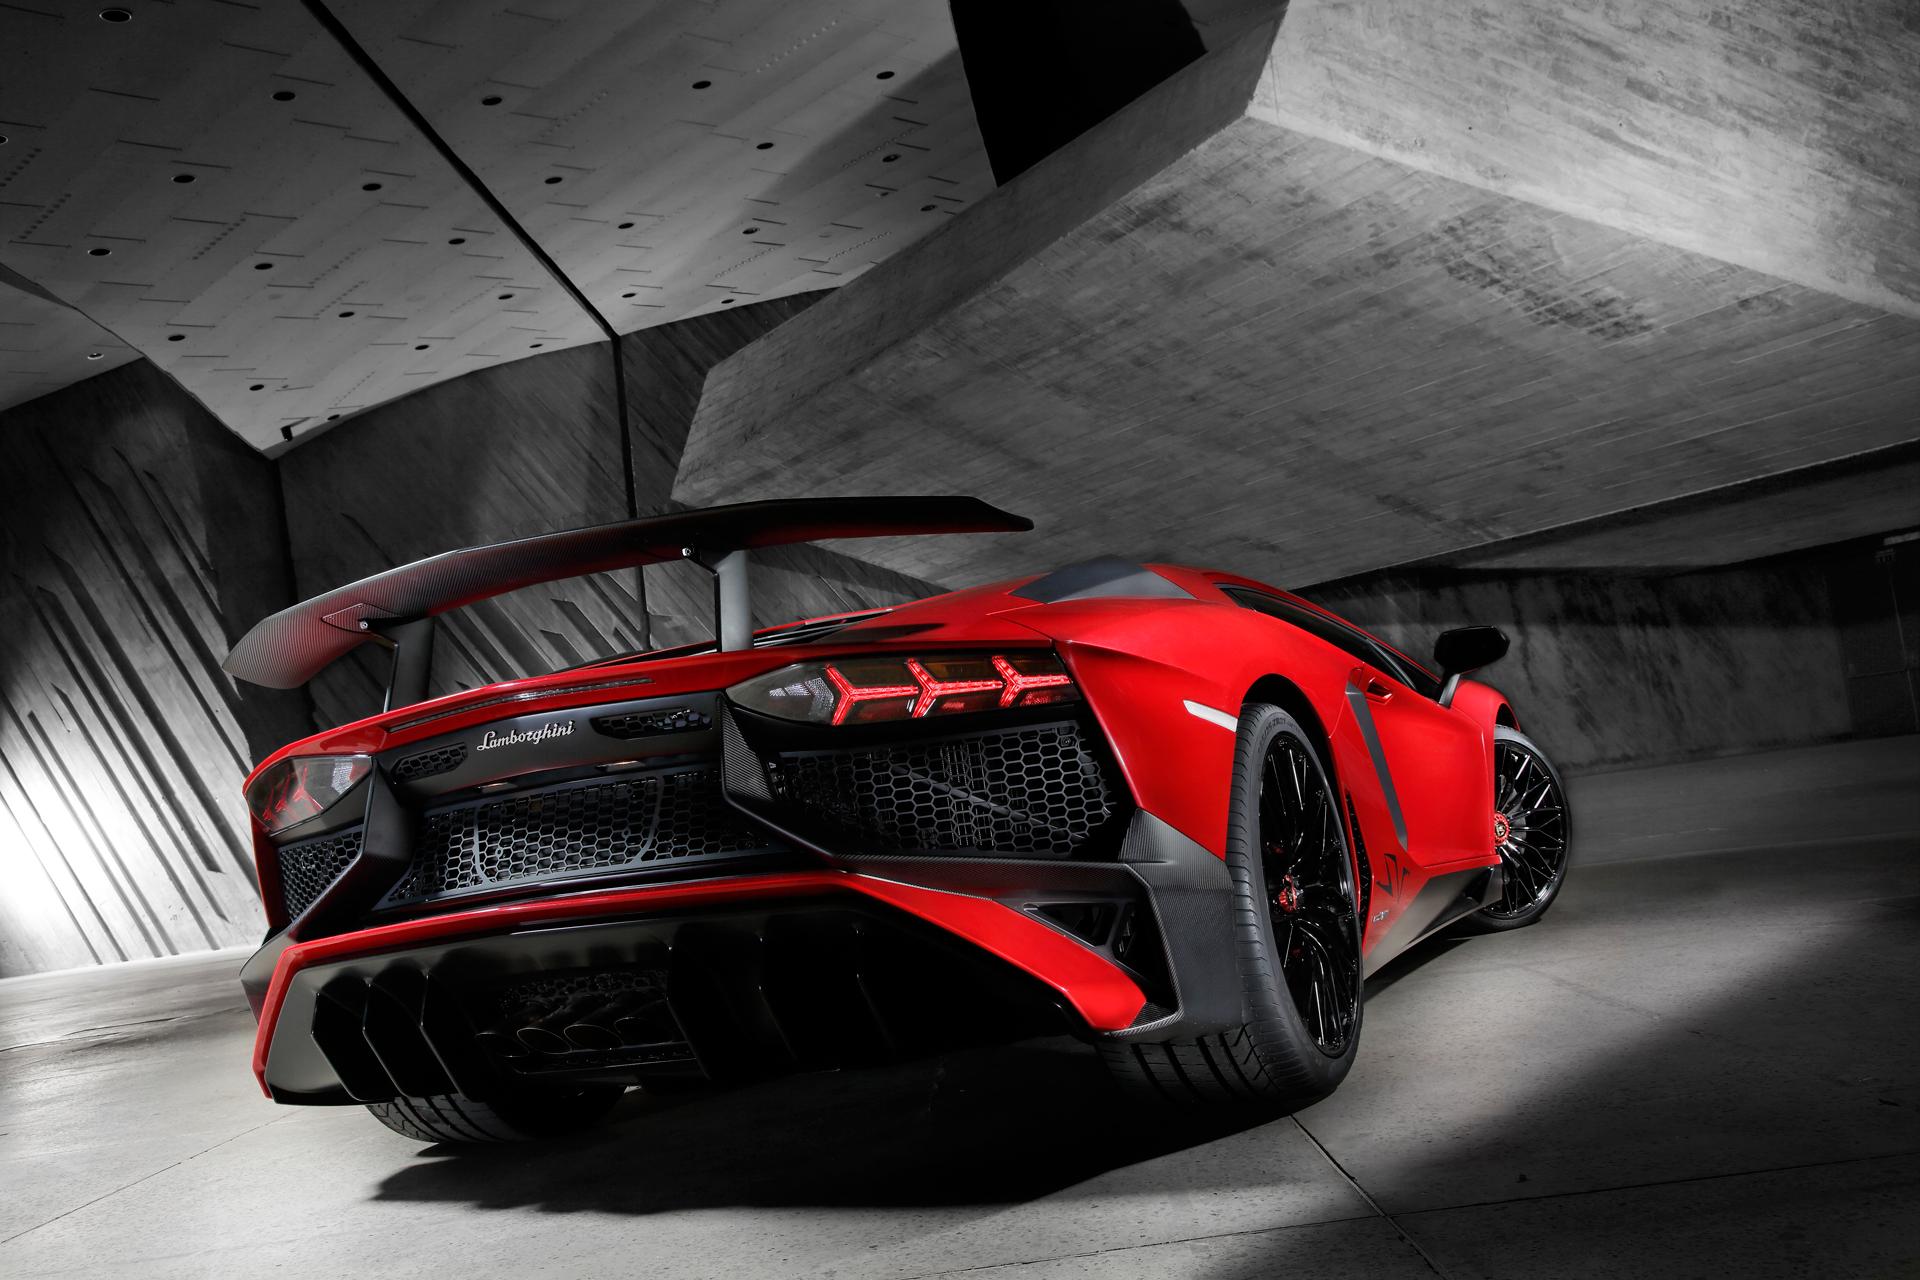 Lamborghini LP750-4 Superveloce - profil arrière